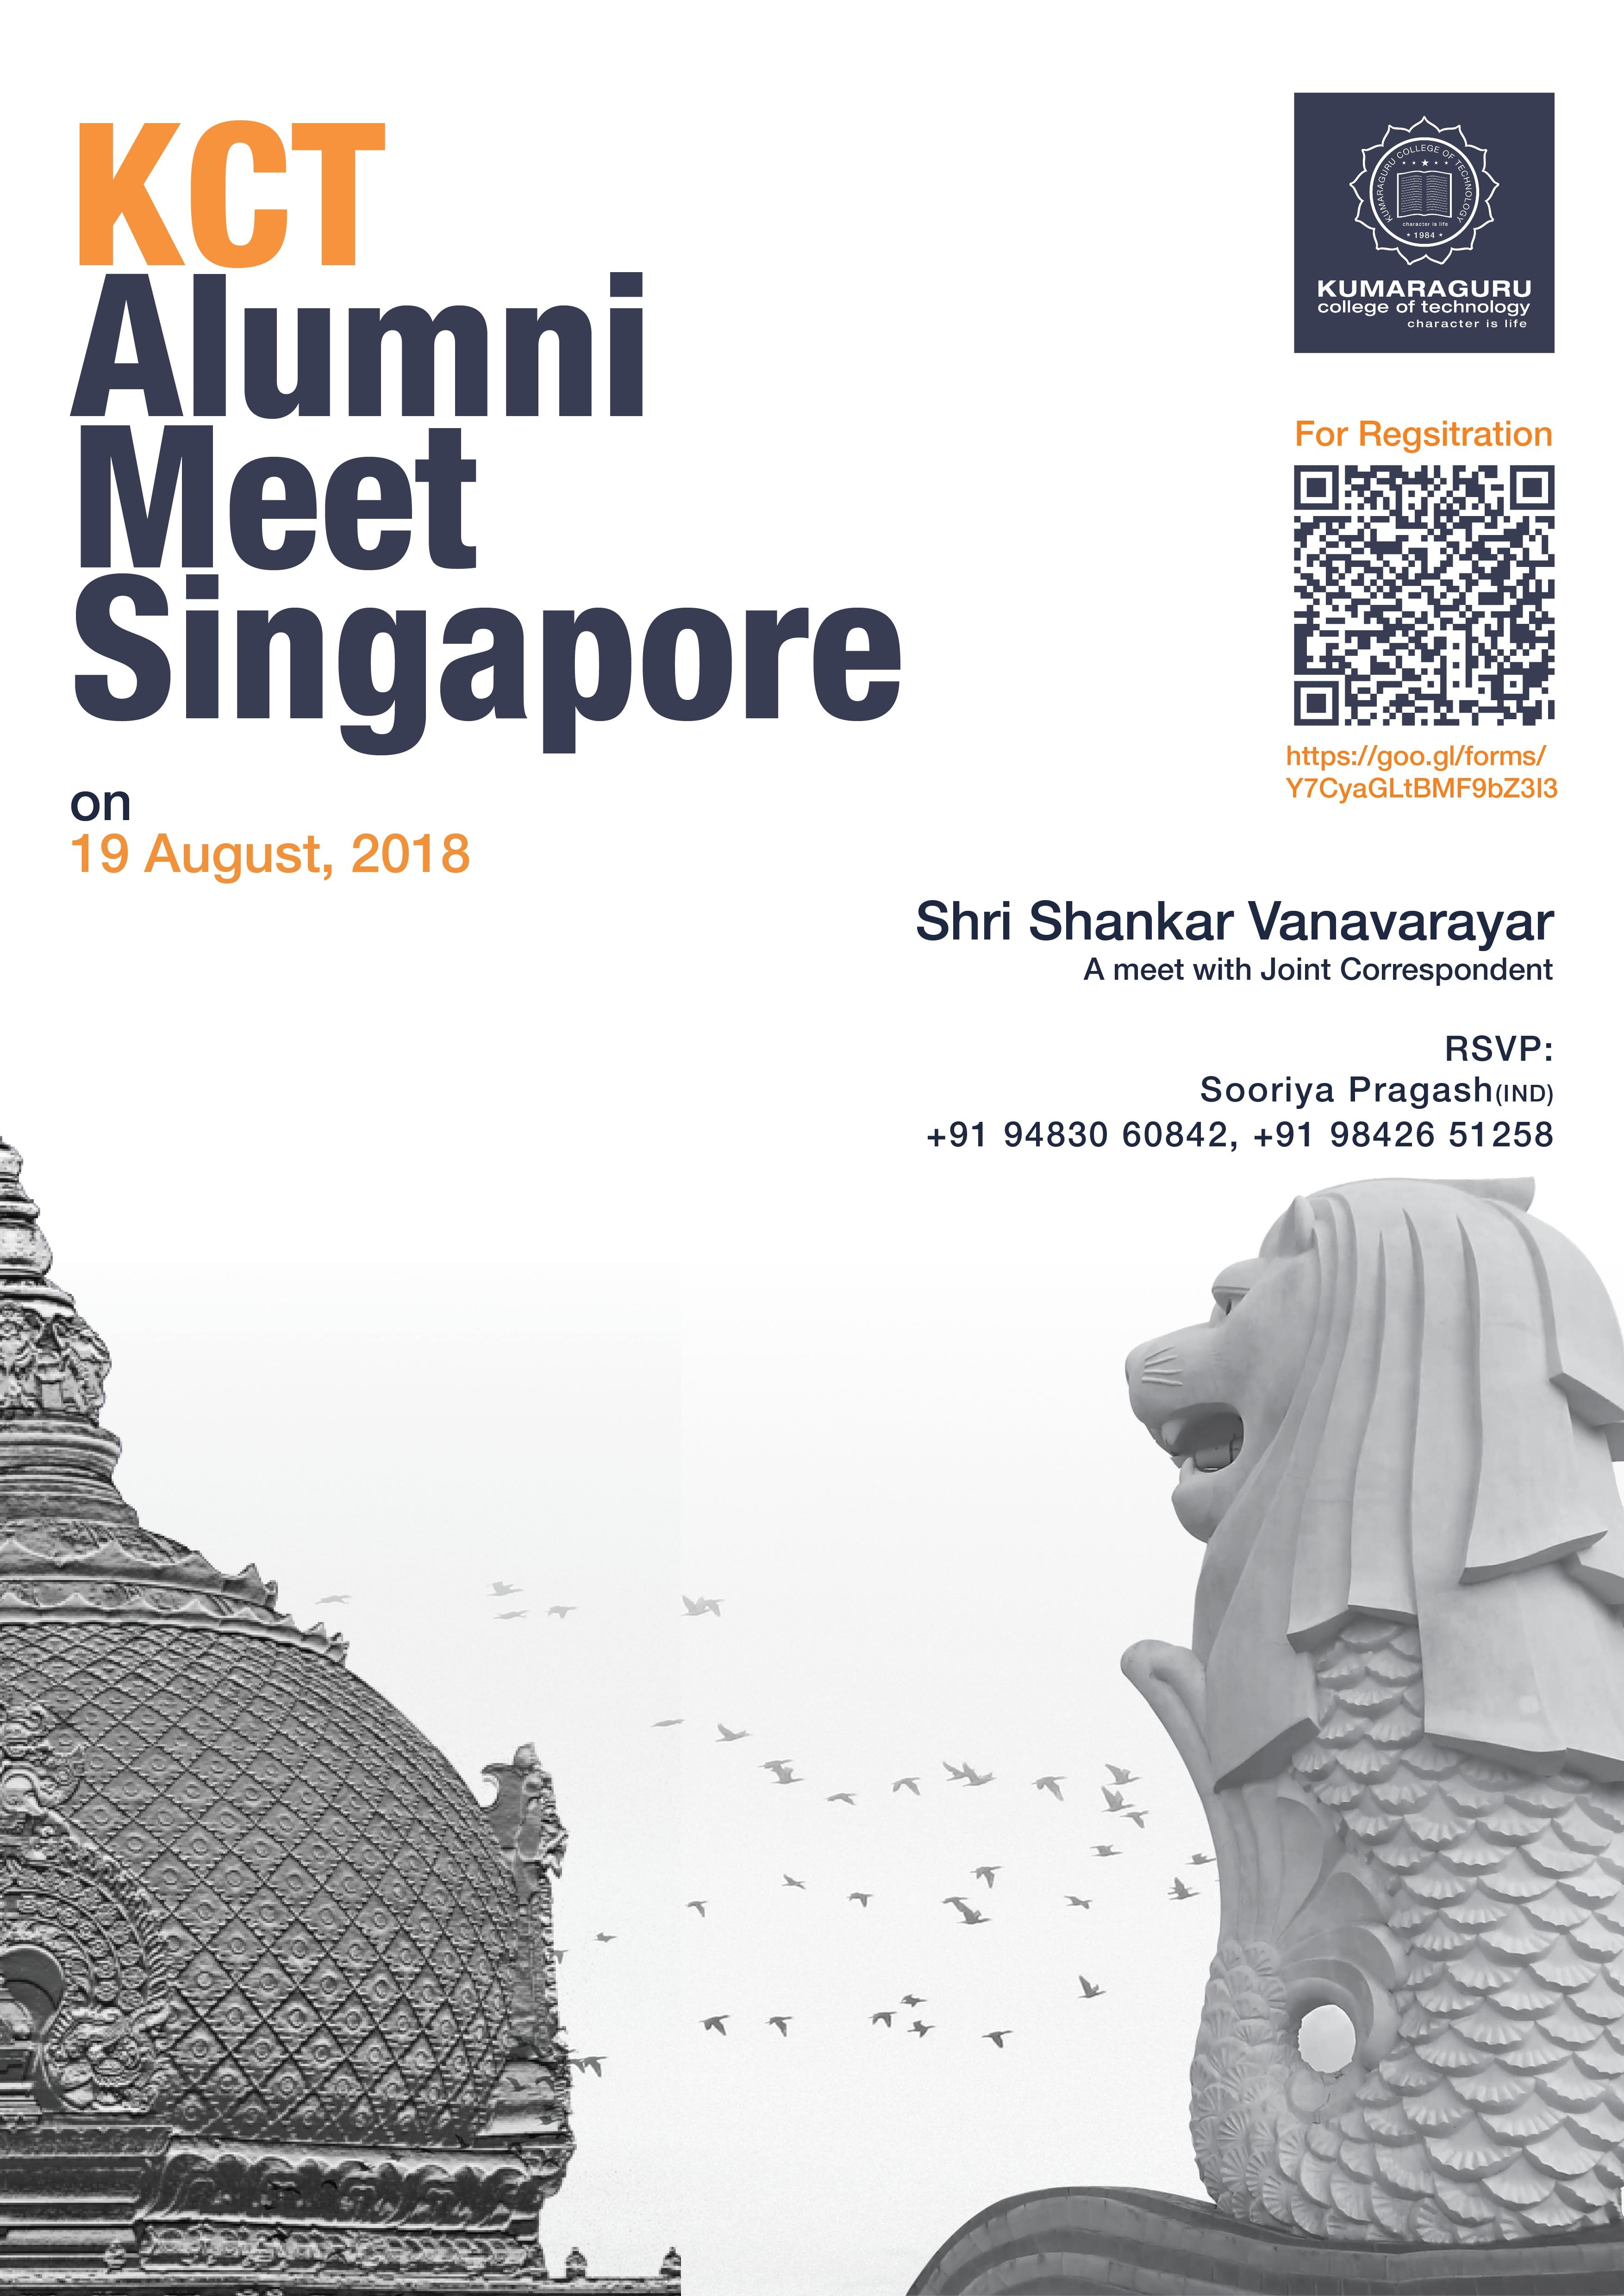 KCT Alumni Meet Singapore